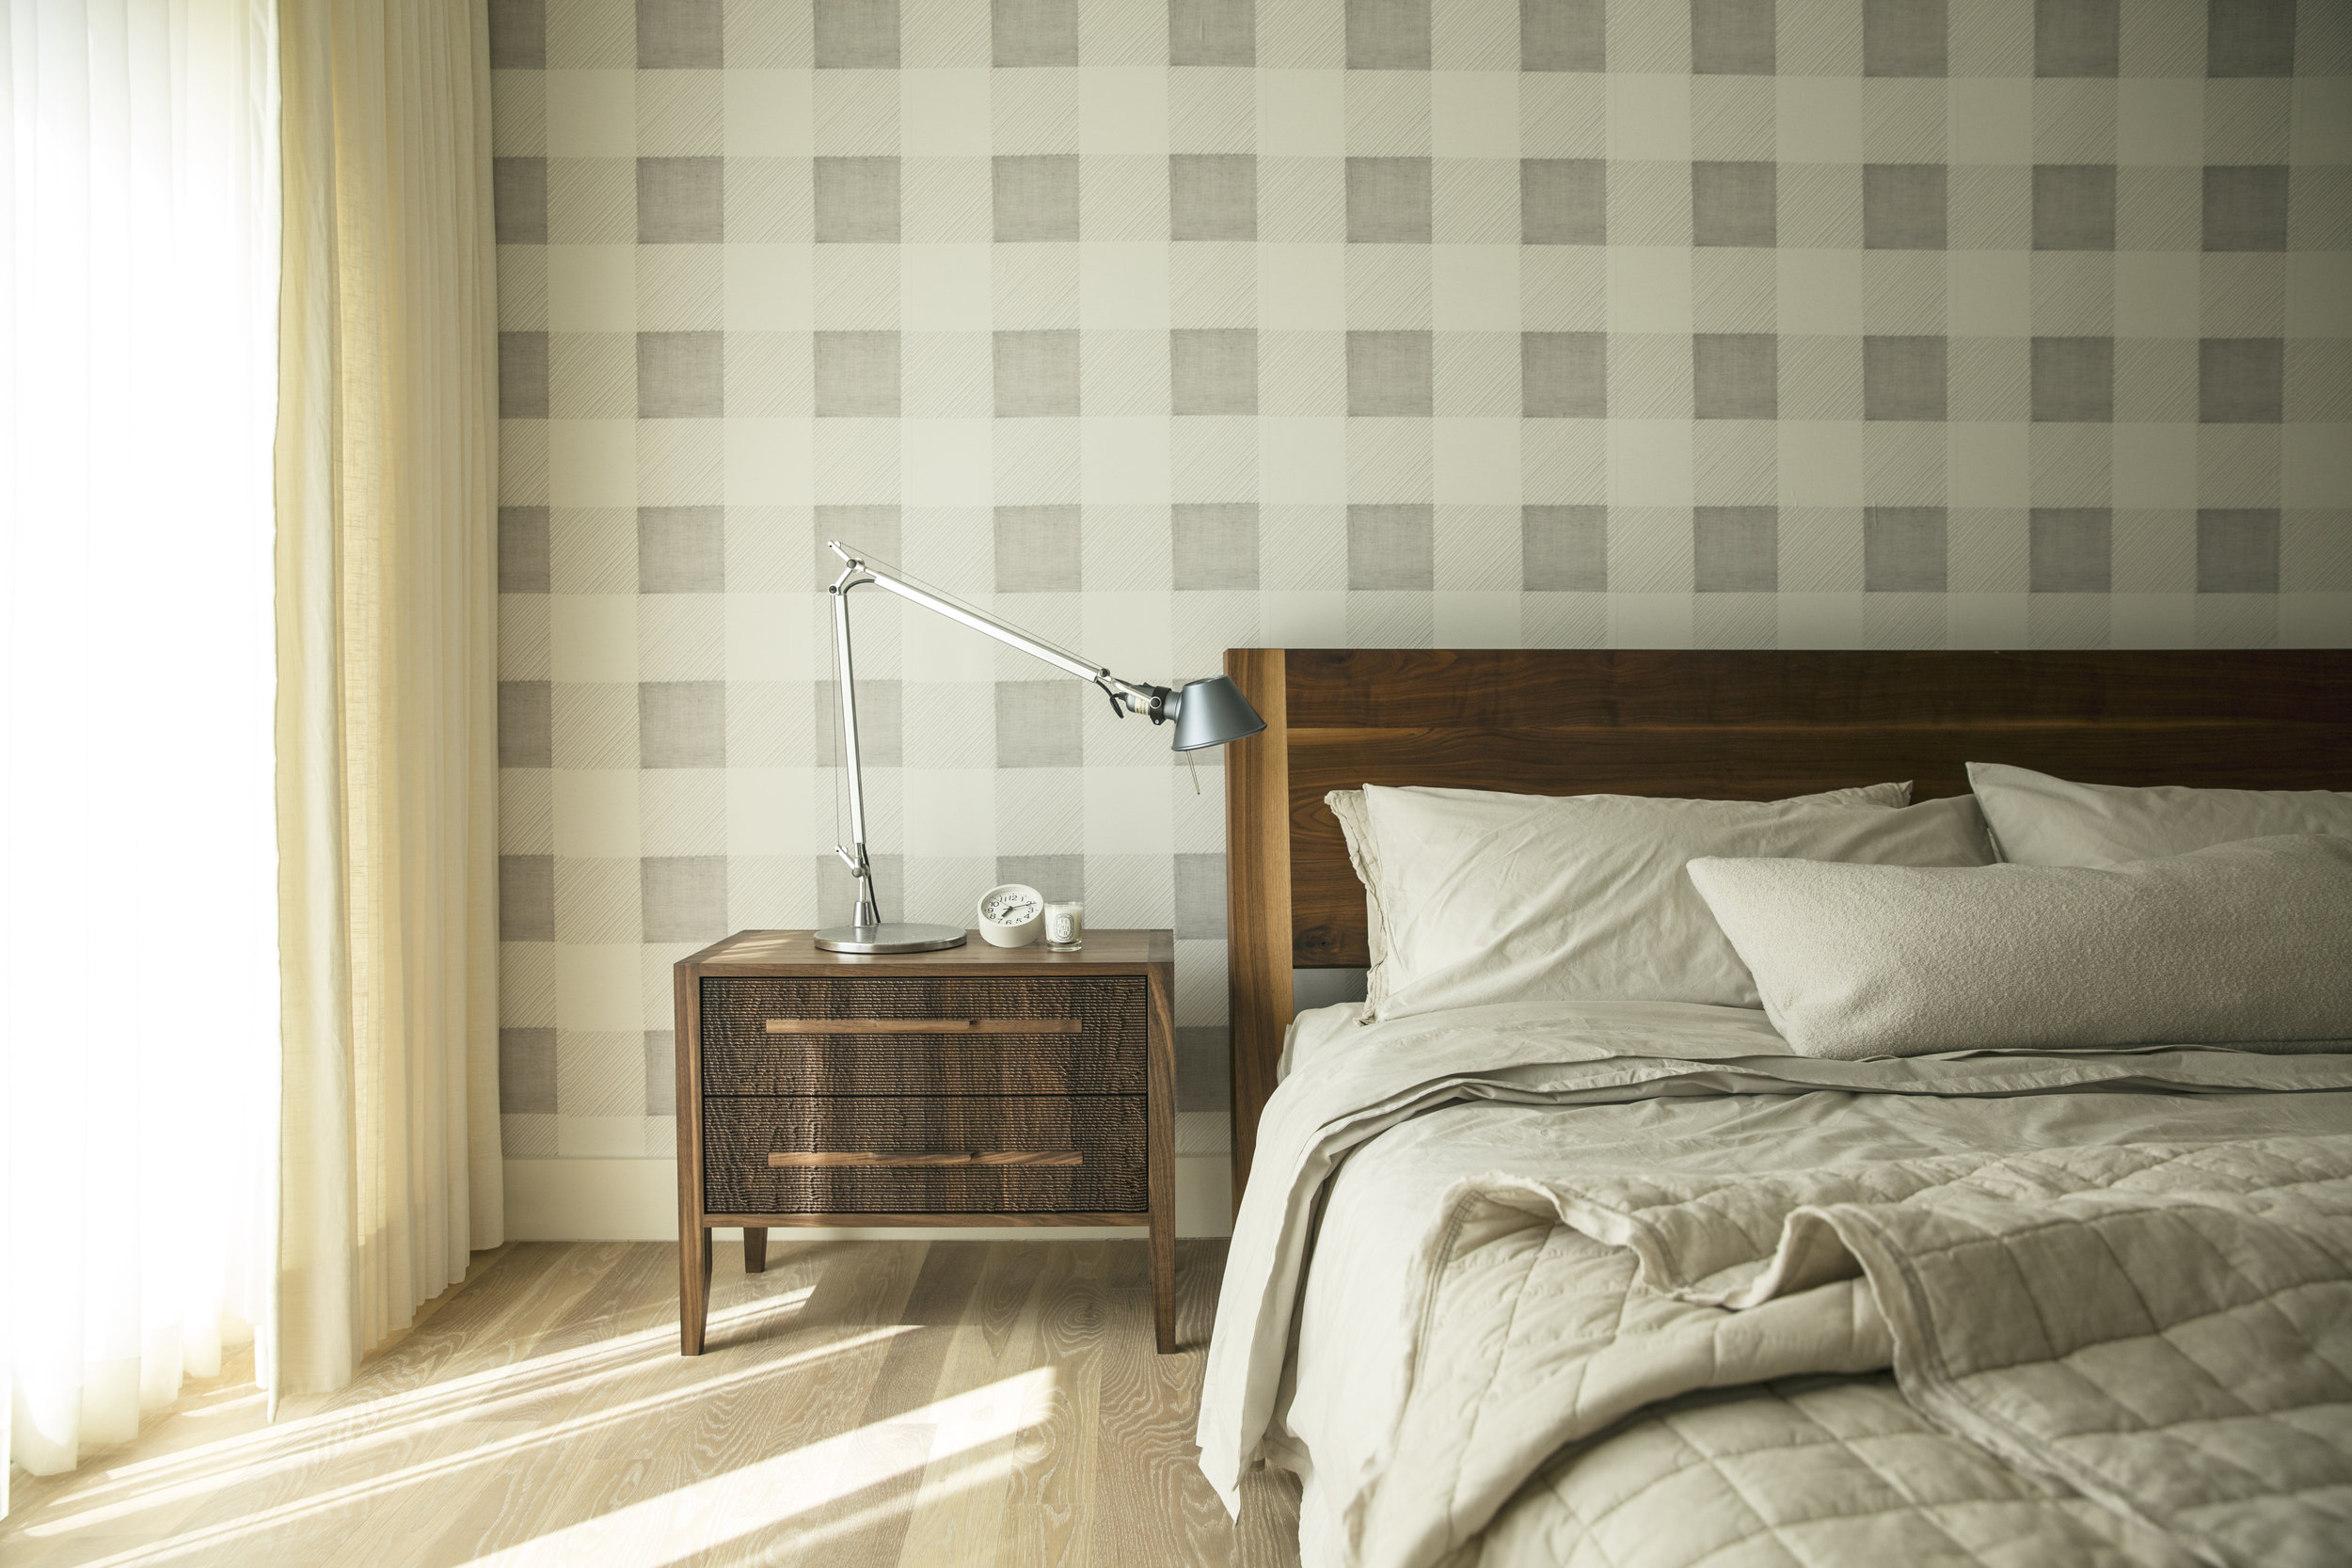 12.Slideshow_LKL-Balboa_Master Bedroom 2x3_Photography by Aubrie Pick.jpg